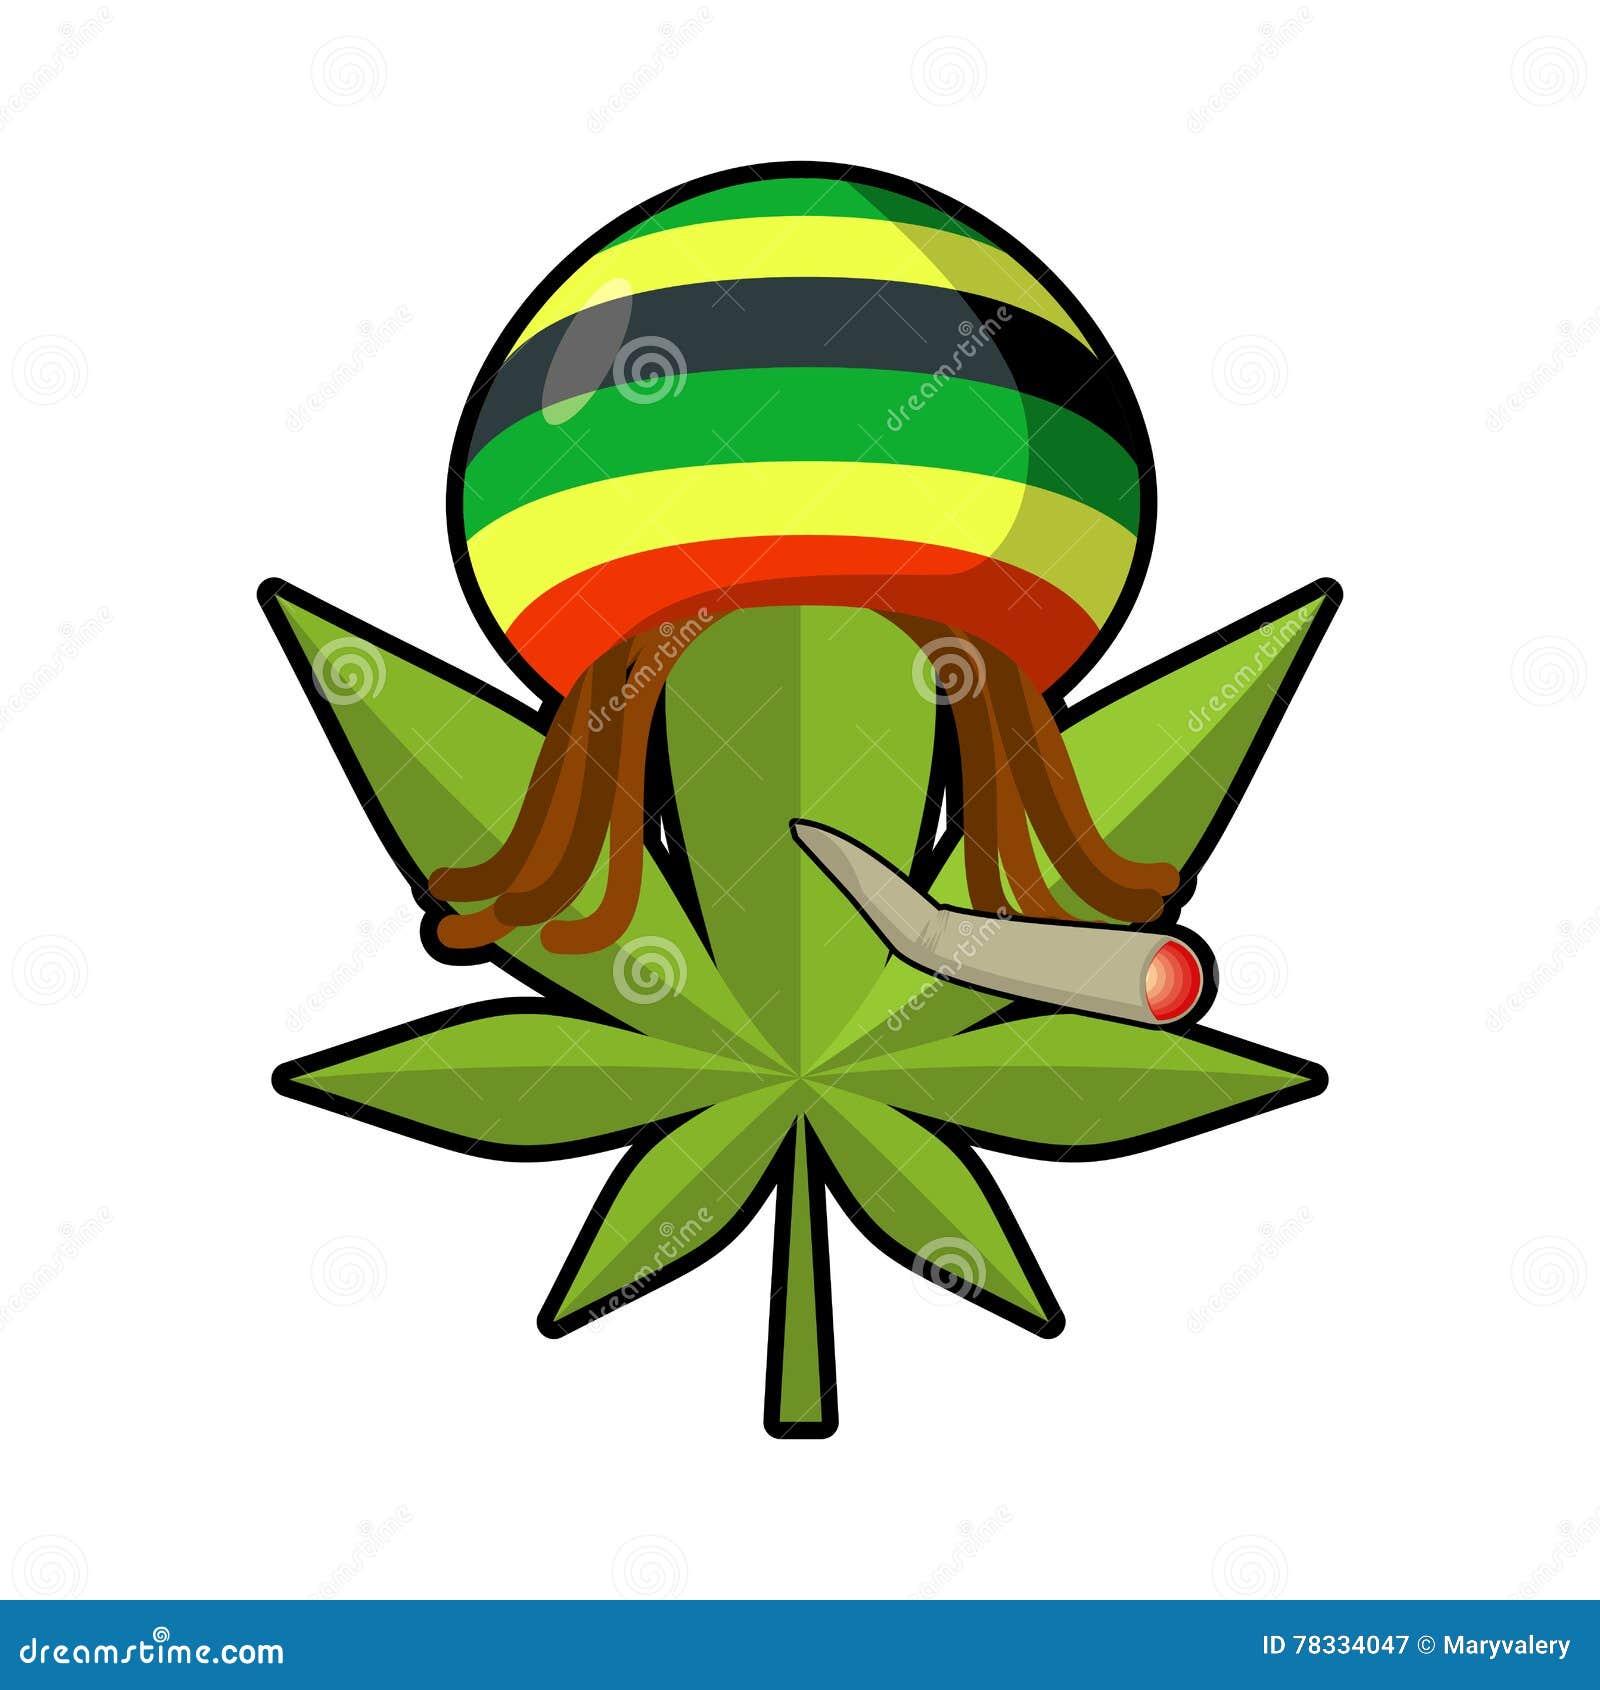 Марихуана и растаман фото марихуана в шаманизме